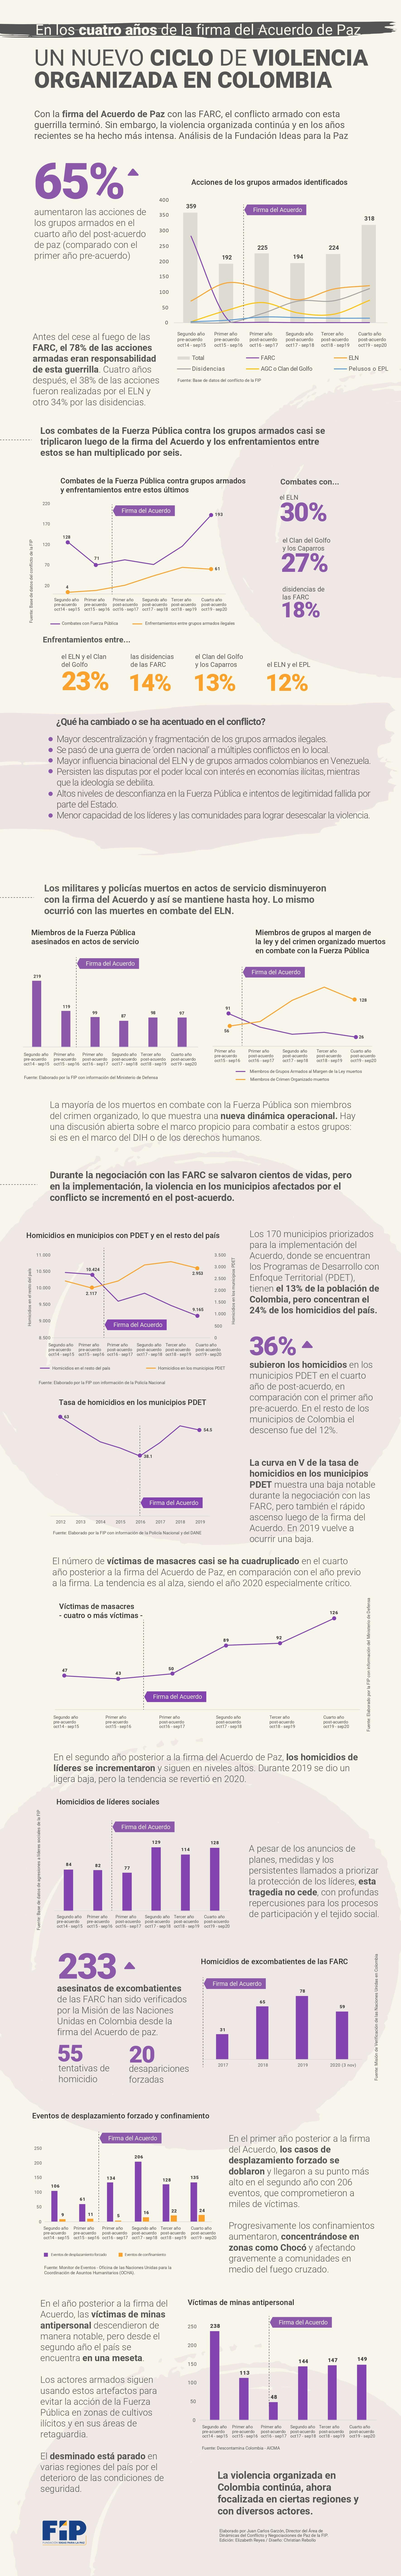 Infografia_Paz_FIP